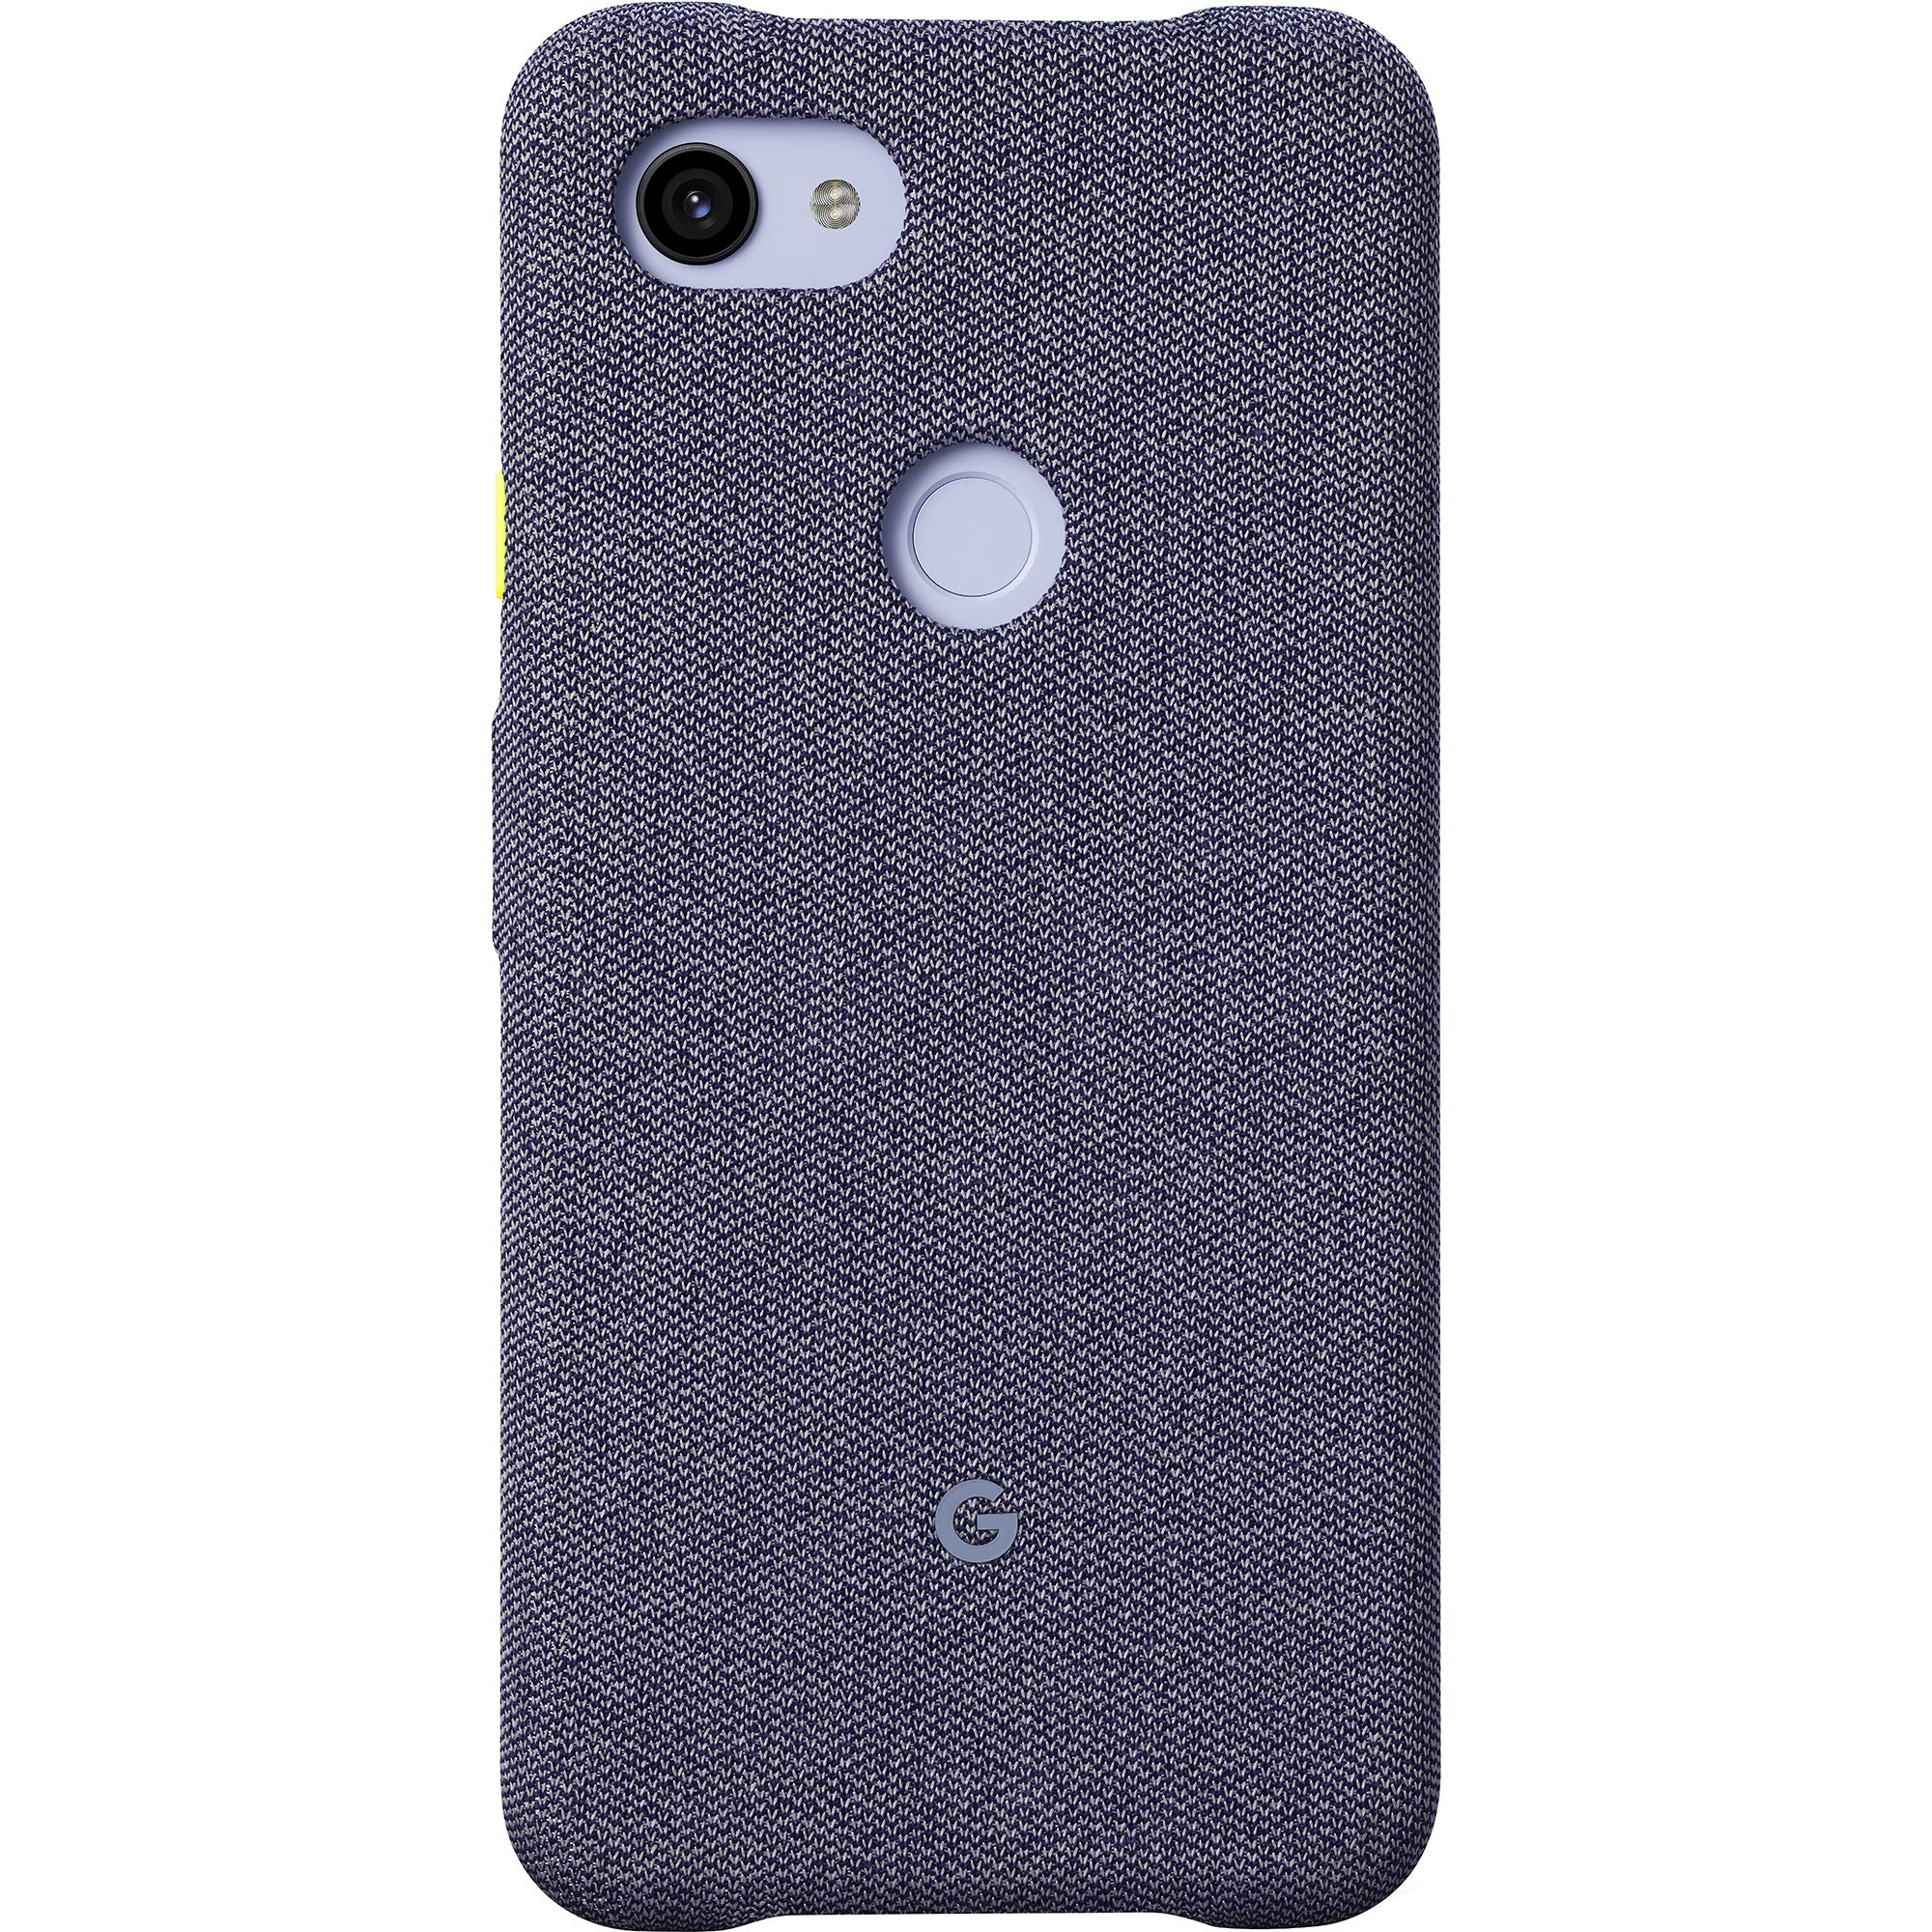 Pixel 3a XL Case, Seascape